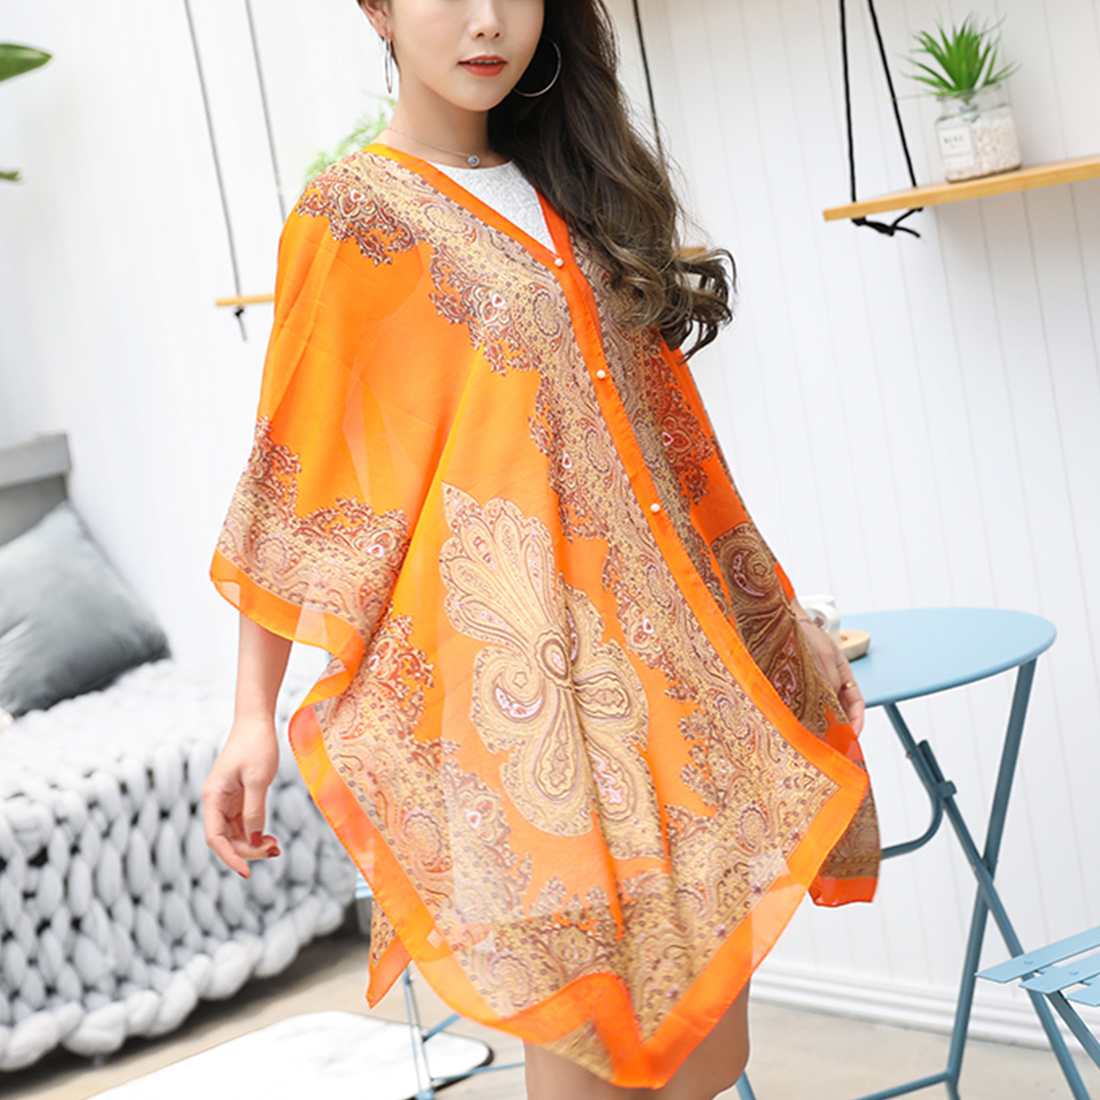 Fashion Style Women Scarf Chiffon Print Shawls Clothes for Lady Female Wrap Long Summer Scarf Fully Functional